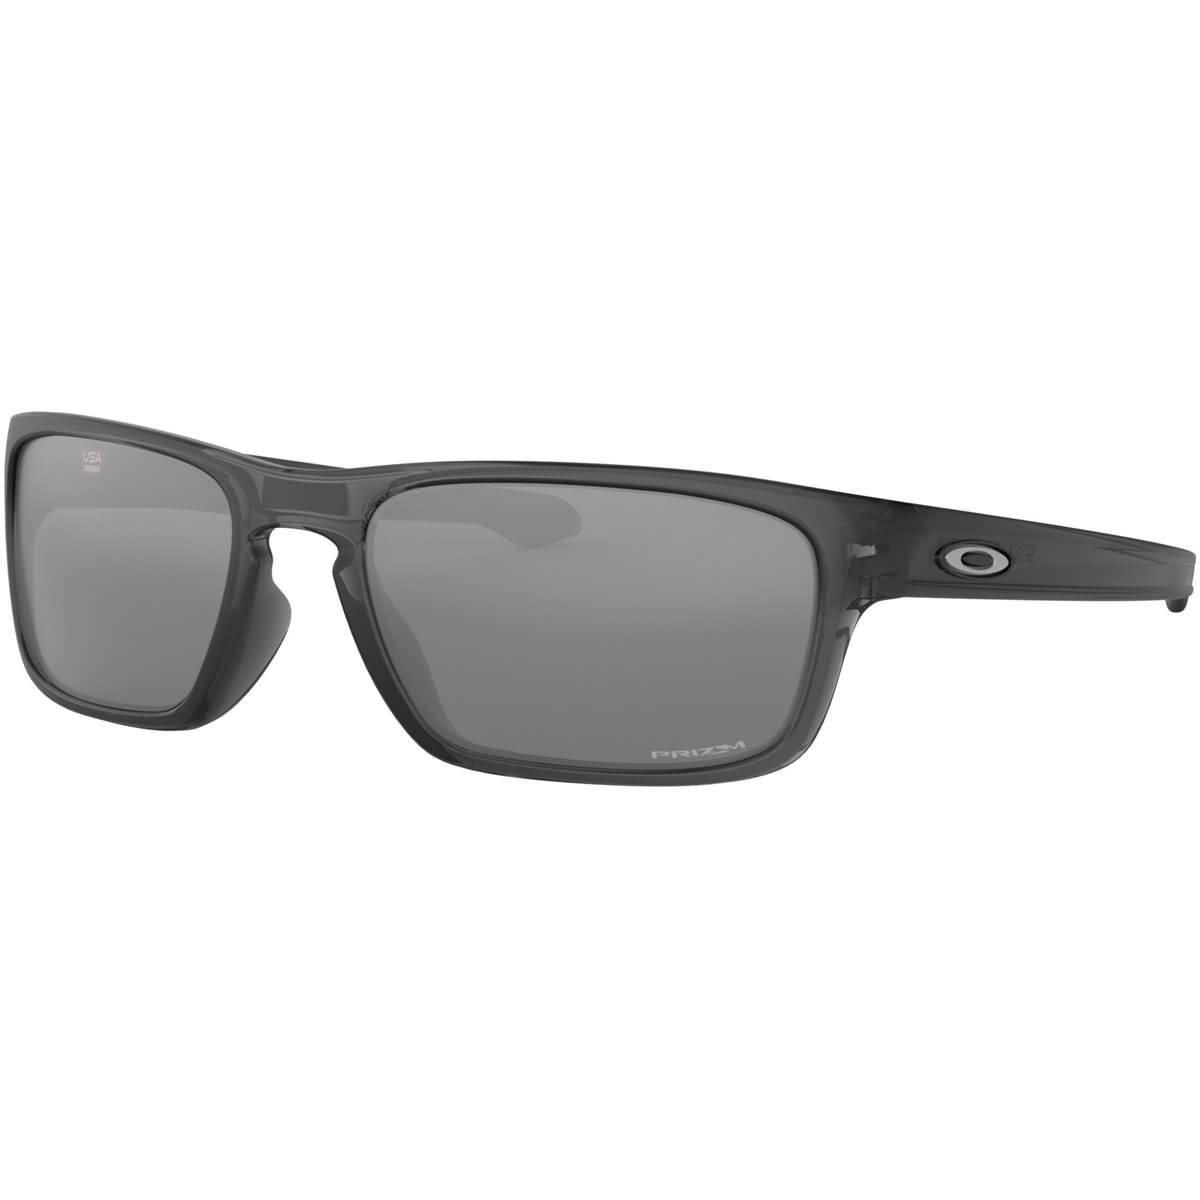 9807002a41 Amazon.com: Oakley Men's Sliver Stealth Non-Polarized Iridium Rectangular  Sunglasses, GREY SMOKE, 55.8 mm: Clothing